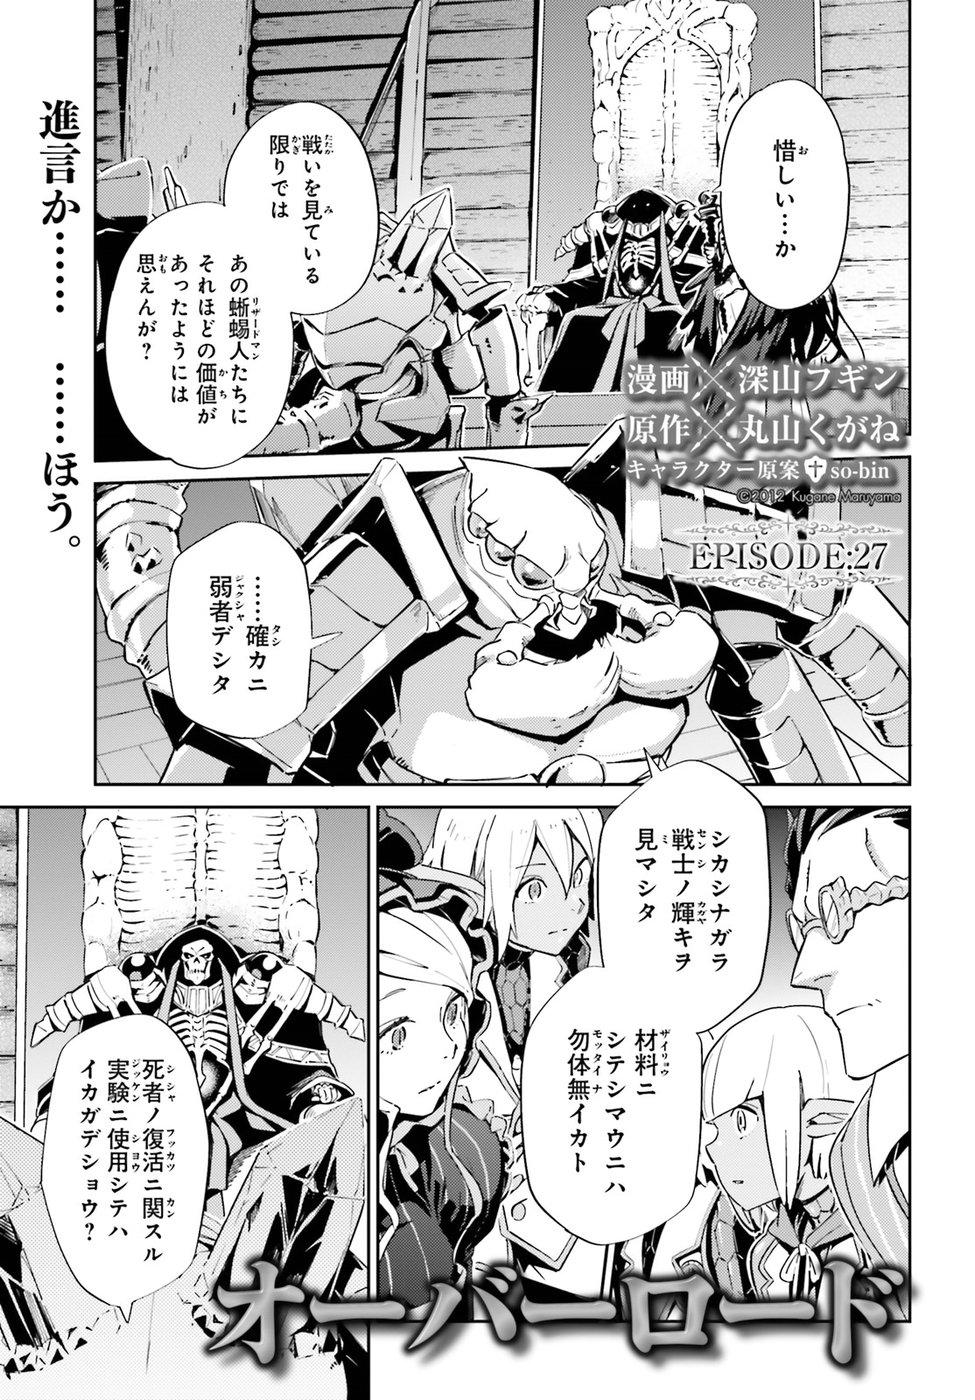 Overlord Manga Chapter 27